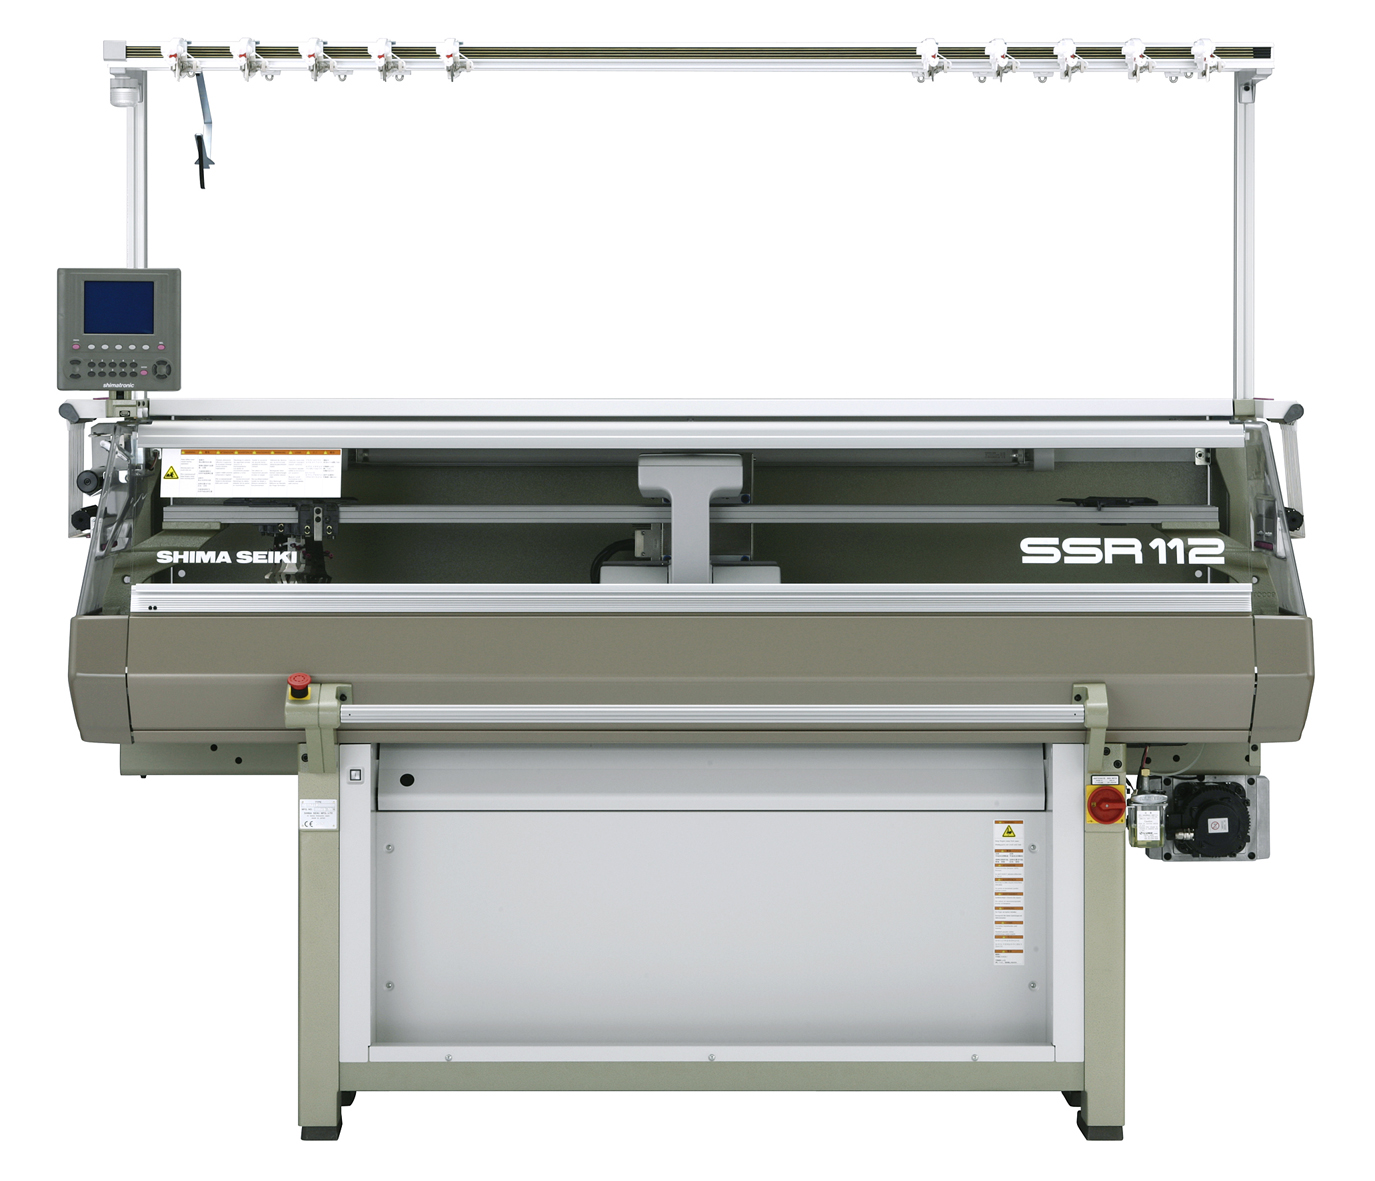 Knitting Machine Programmable : Shima seiki to exhibit at bangladesh apparel safety expo